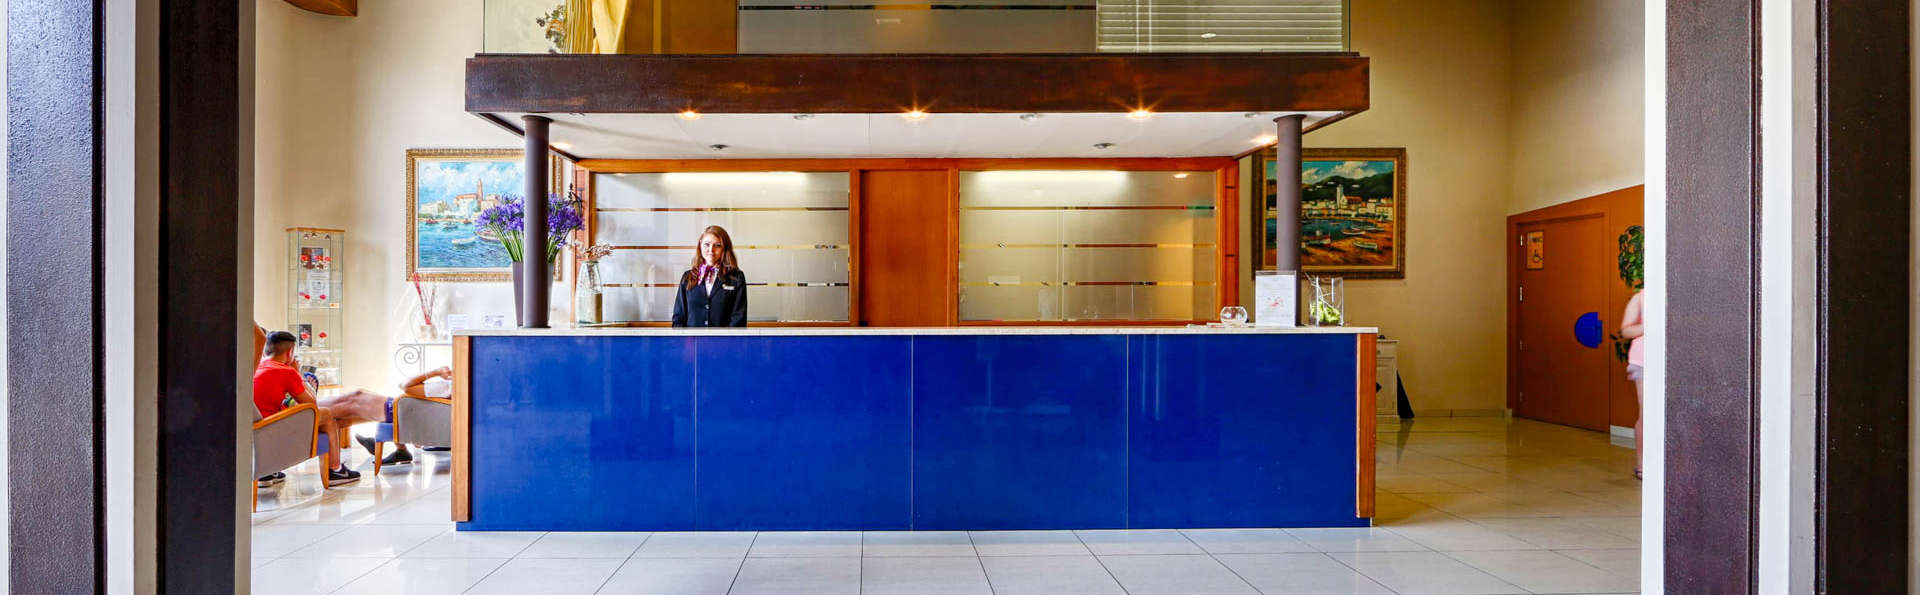 Hotel Espanya - EDIT_RECEPTION3.jpg